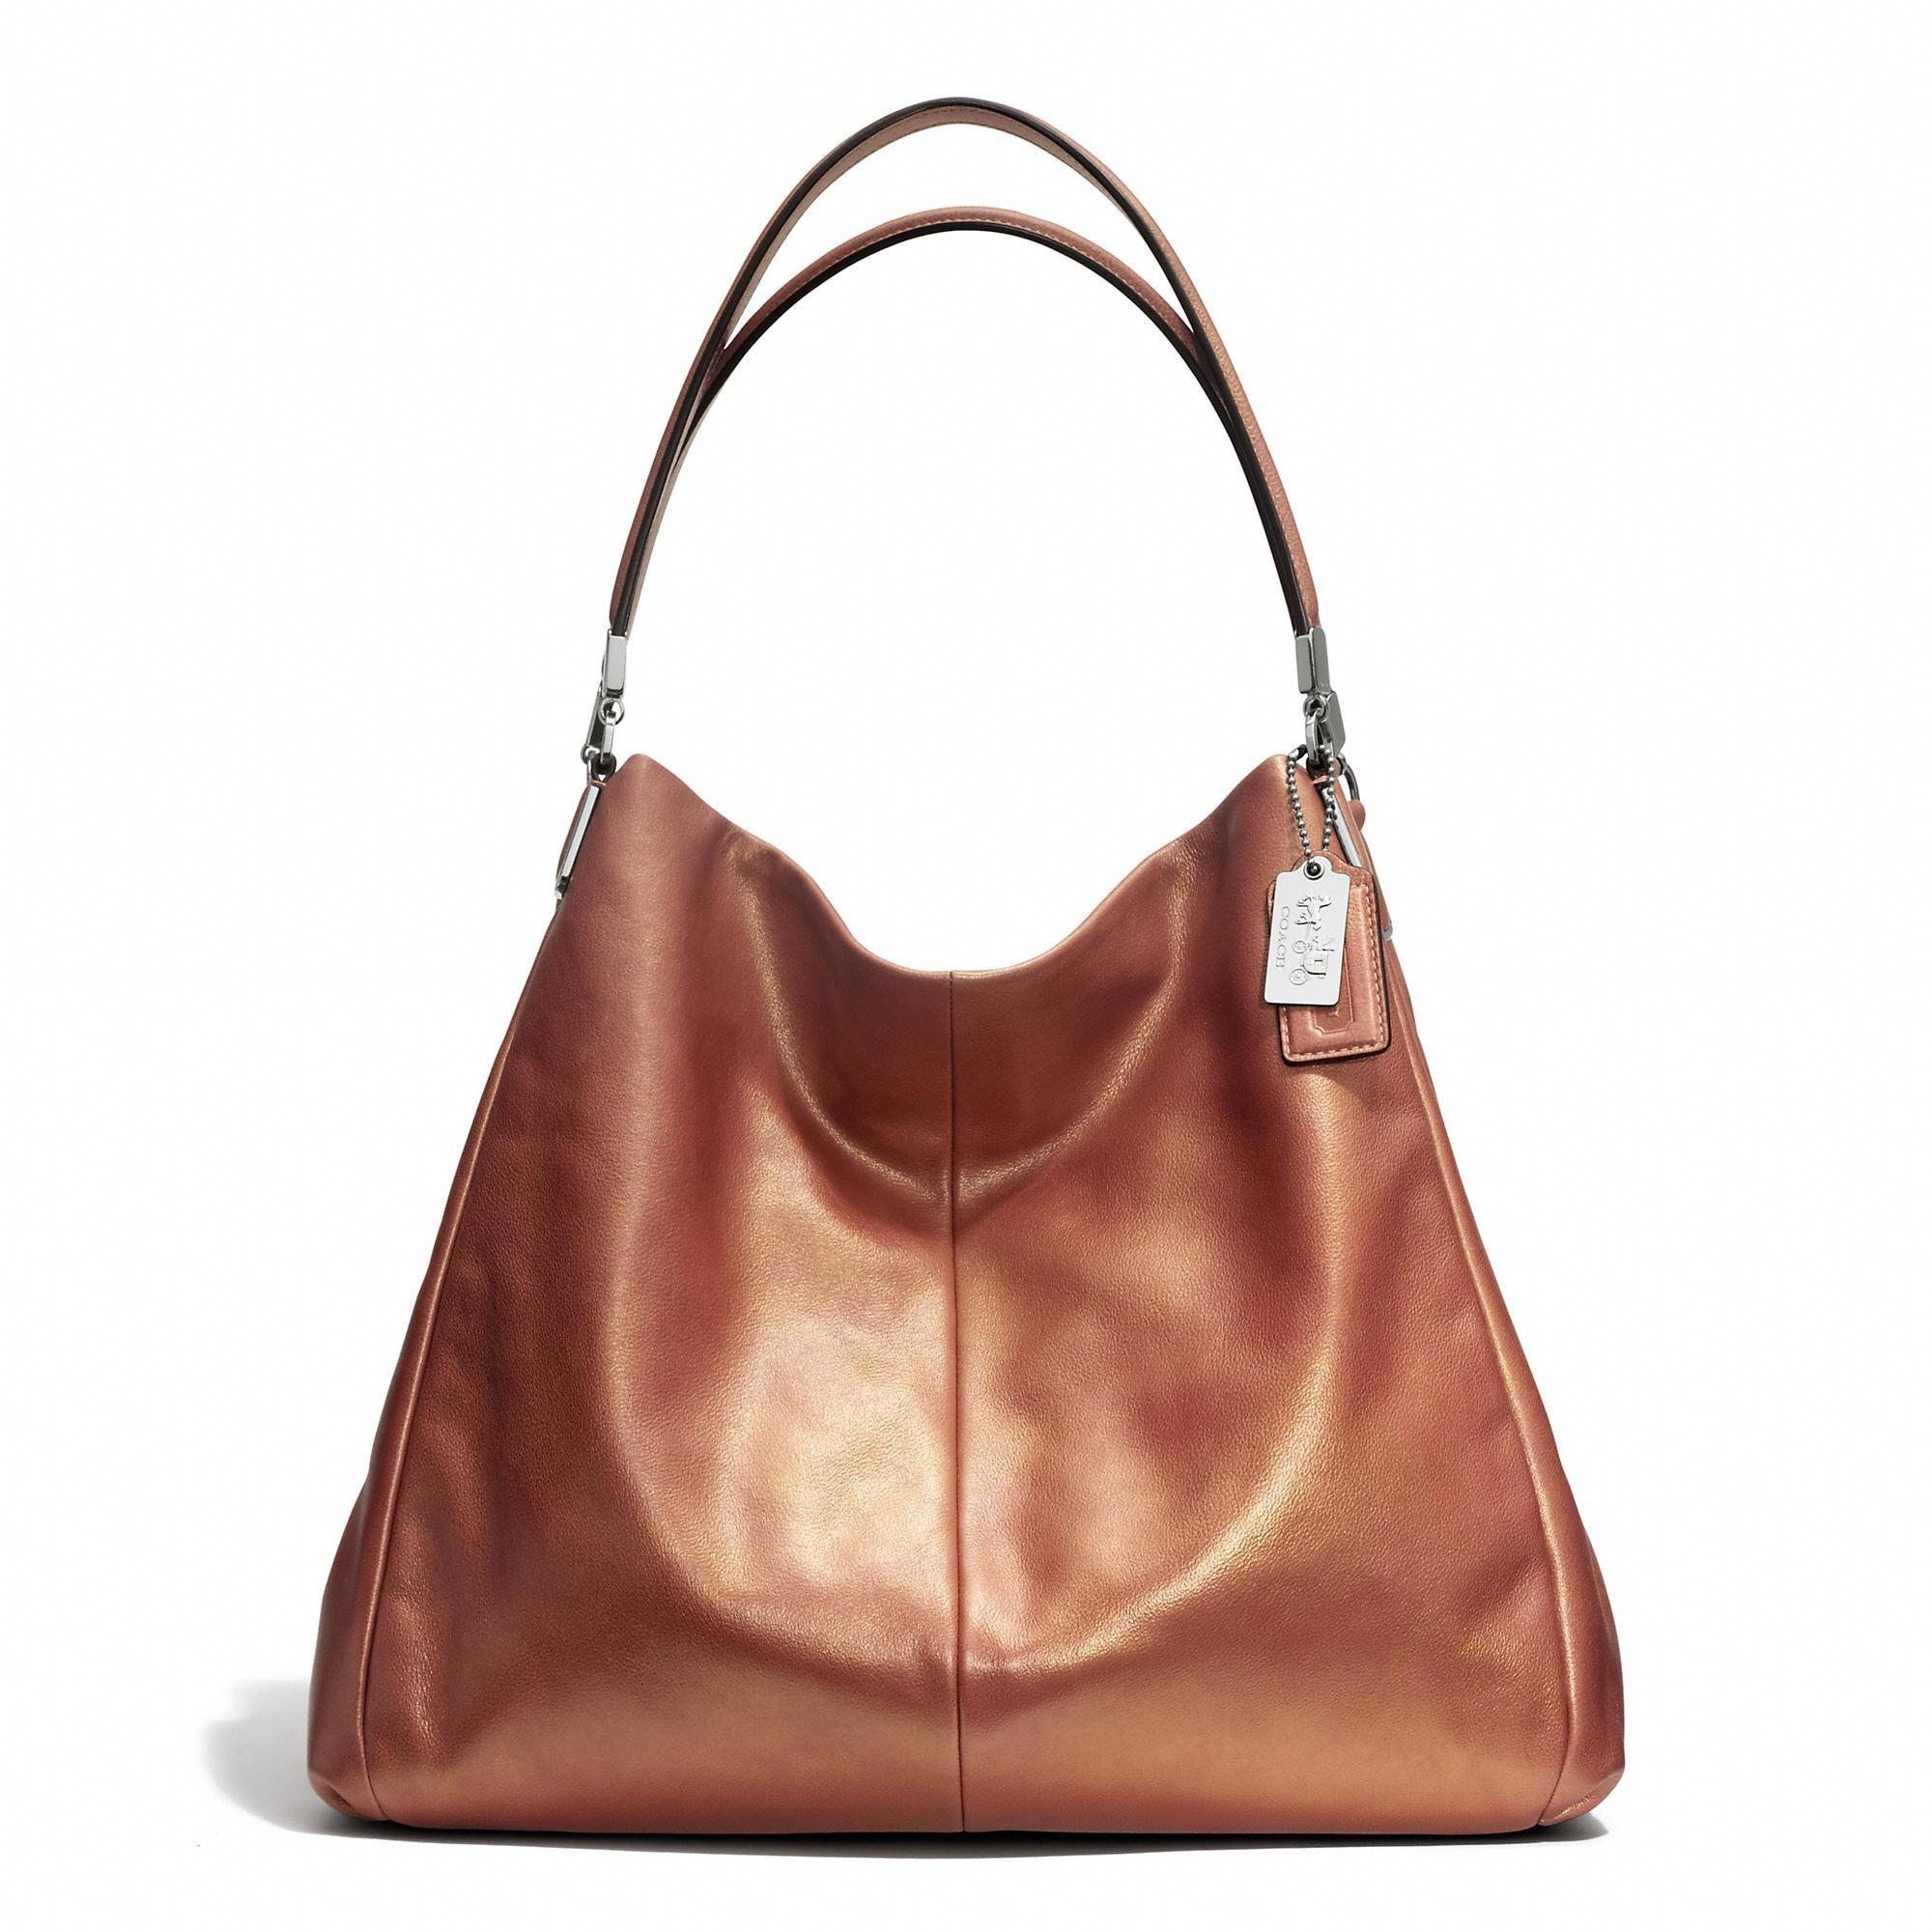 madison phoebe shoulder bag in metallic leather in rose gold from rh pinterest com